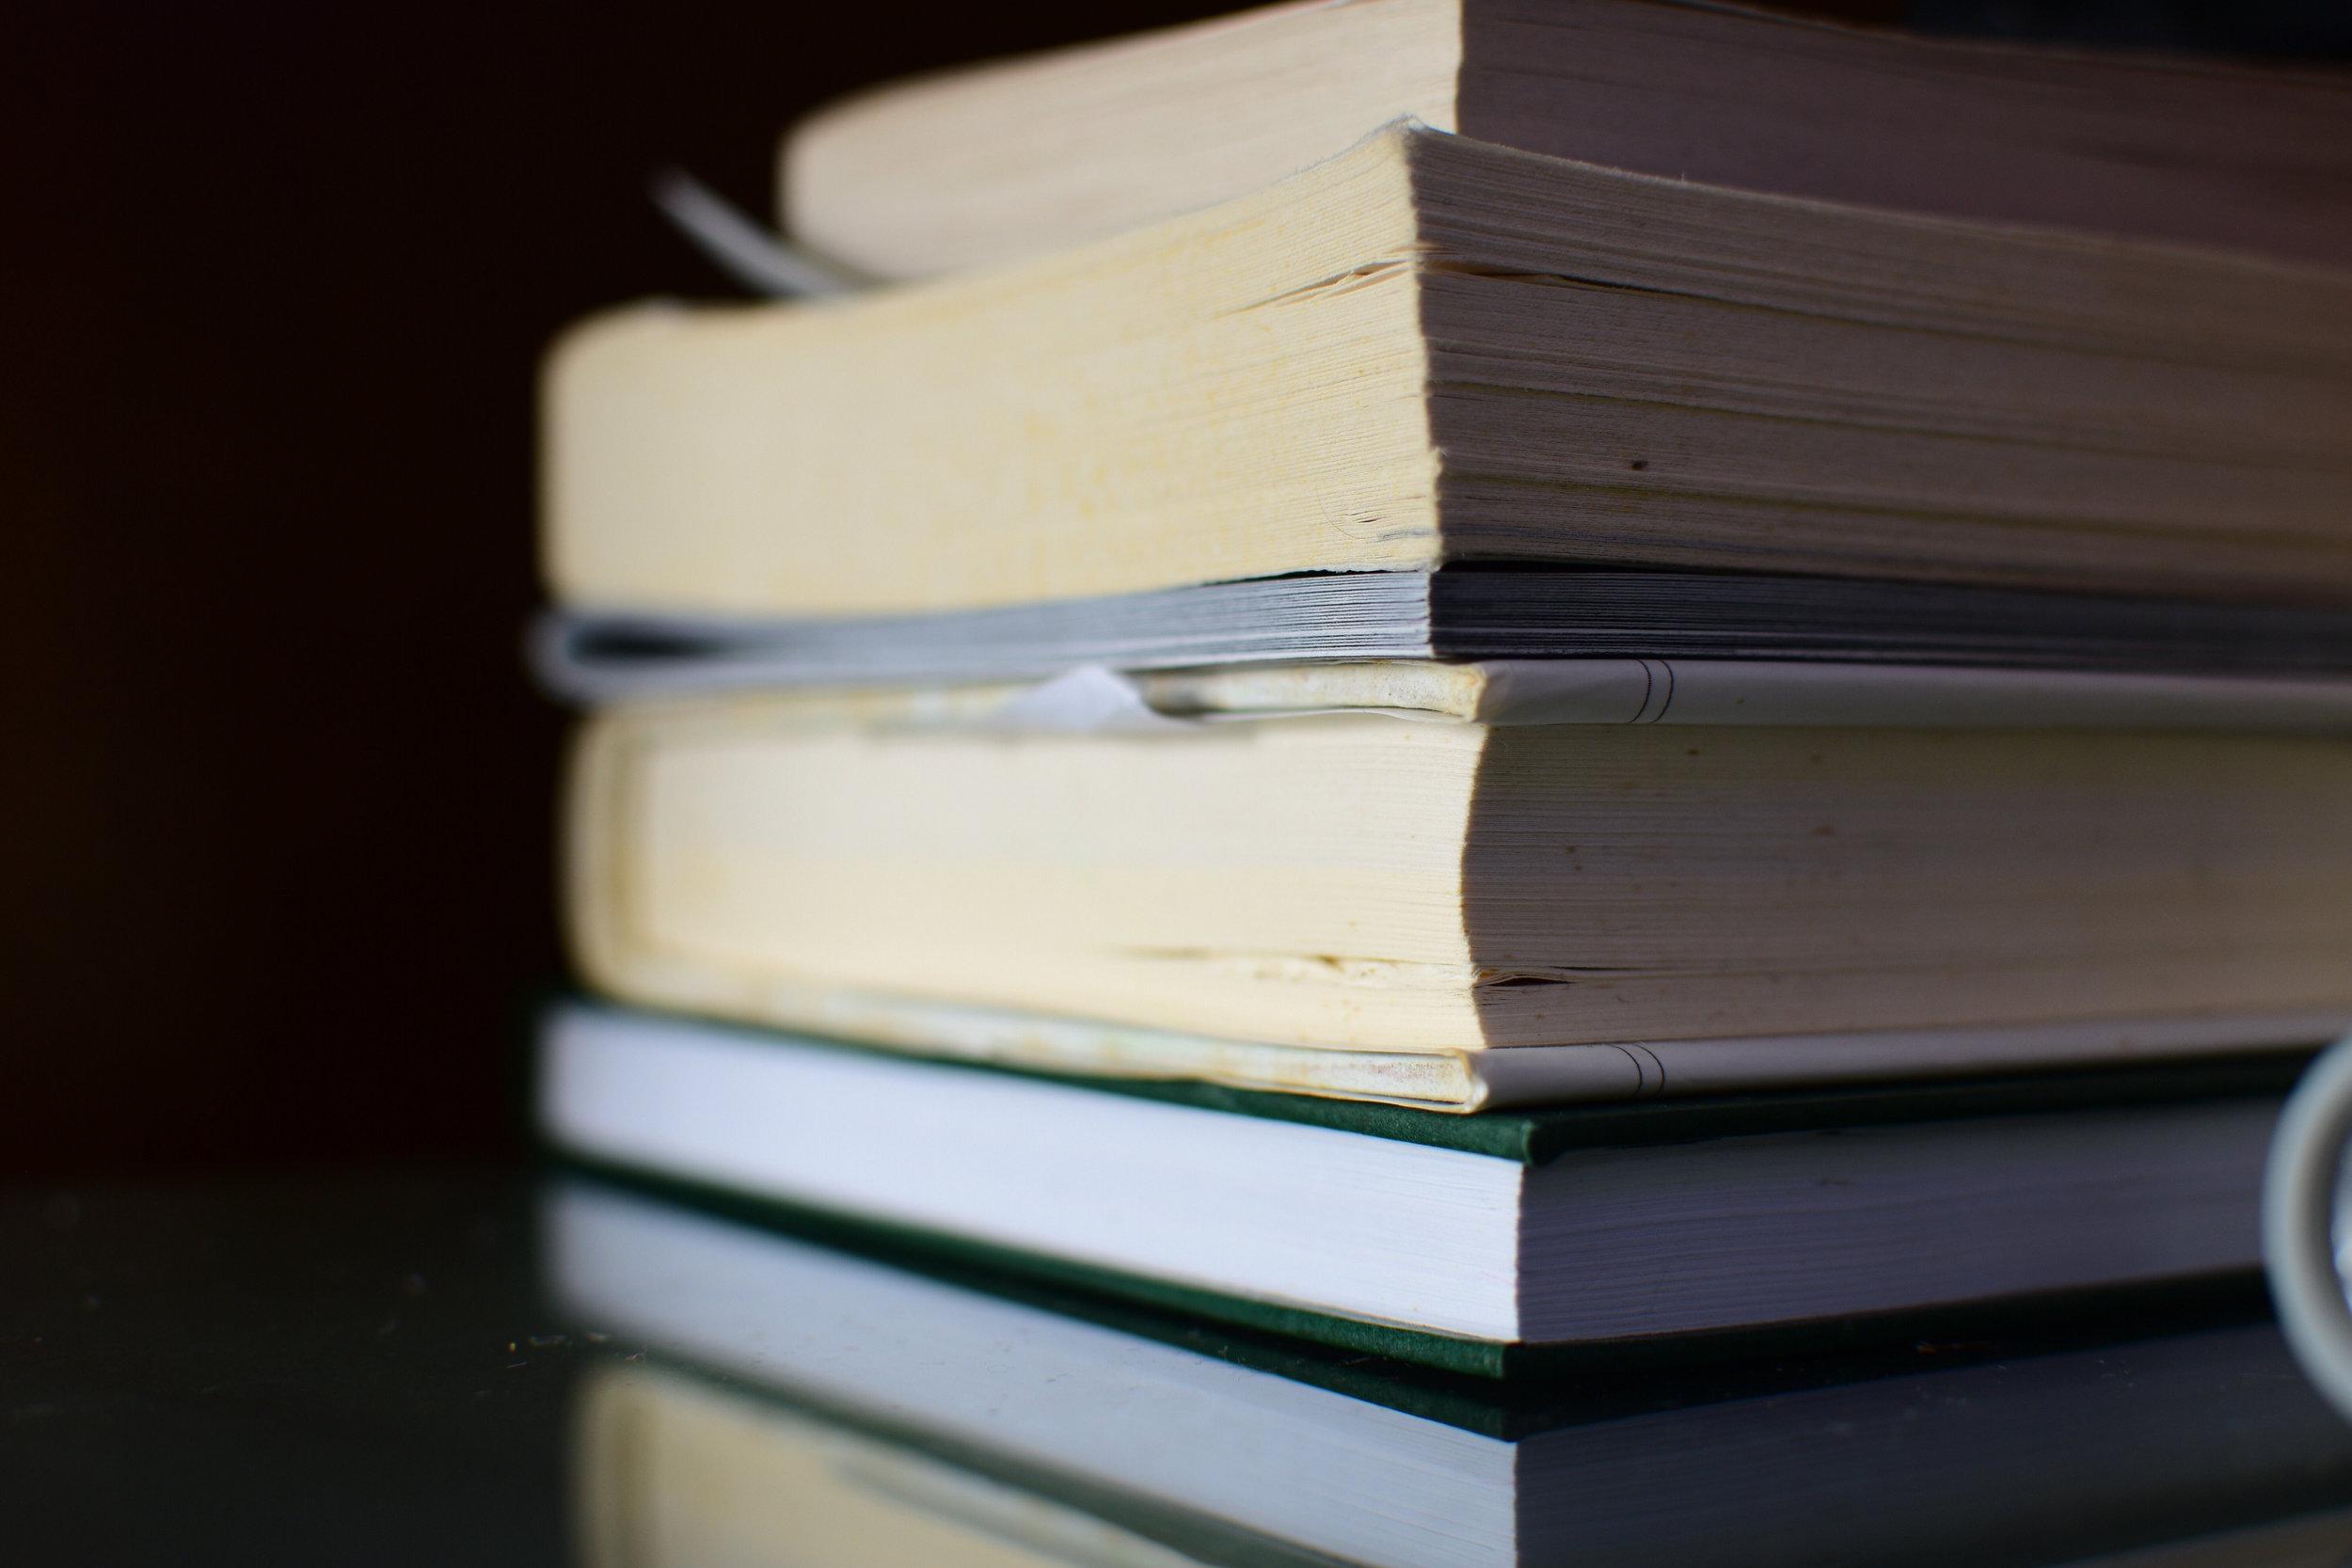 Books, Literacy and Fundraising - Wednesday, September 25